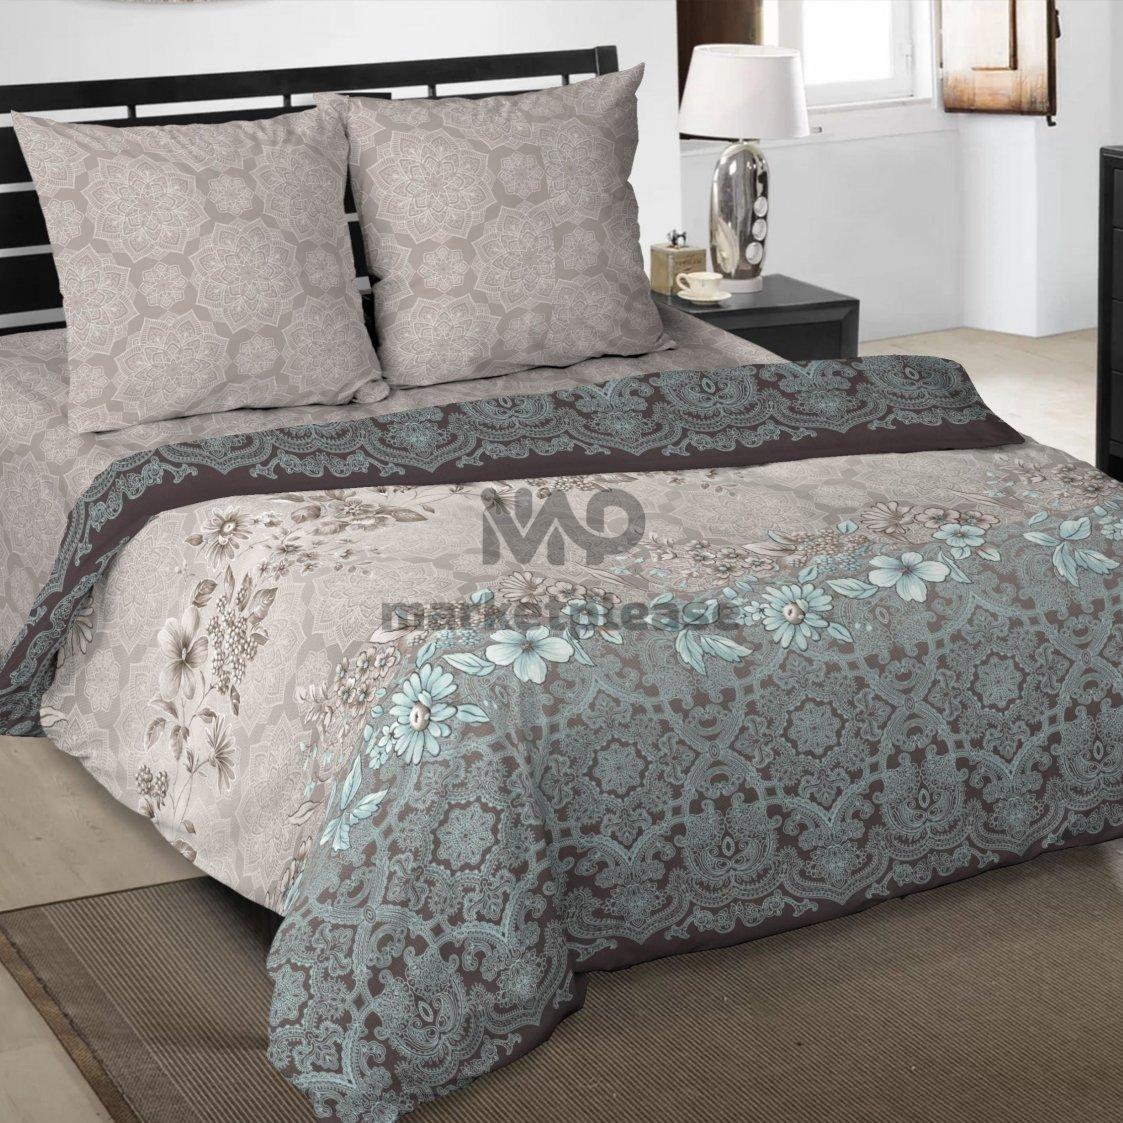 "Рулон ткани бязь ""Изабелла"" 220 см."